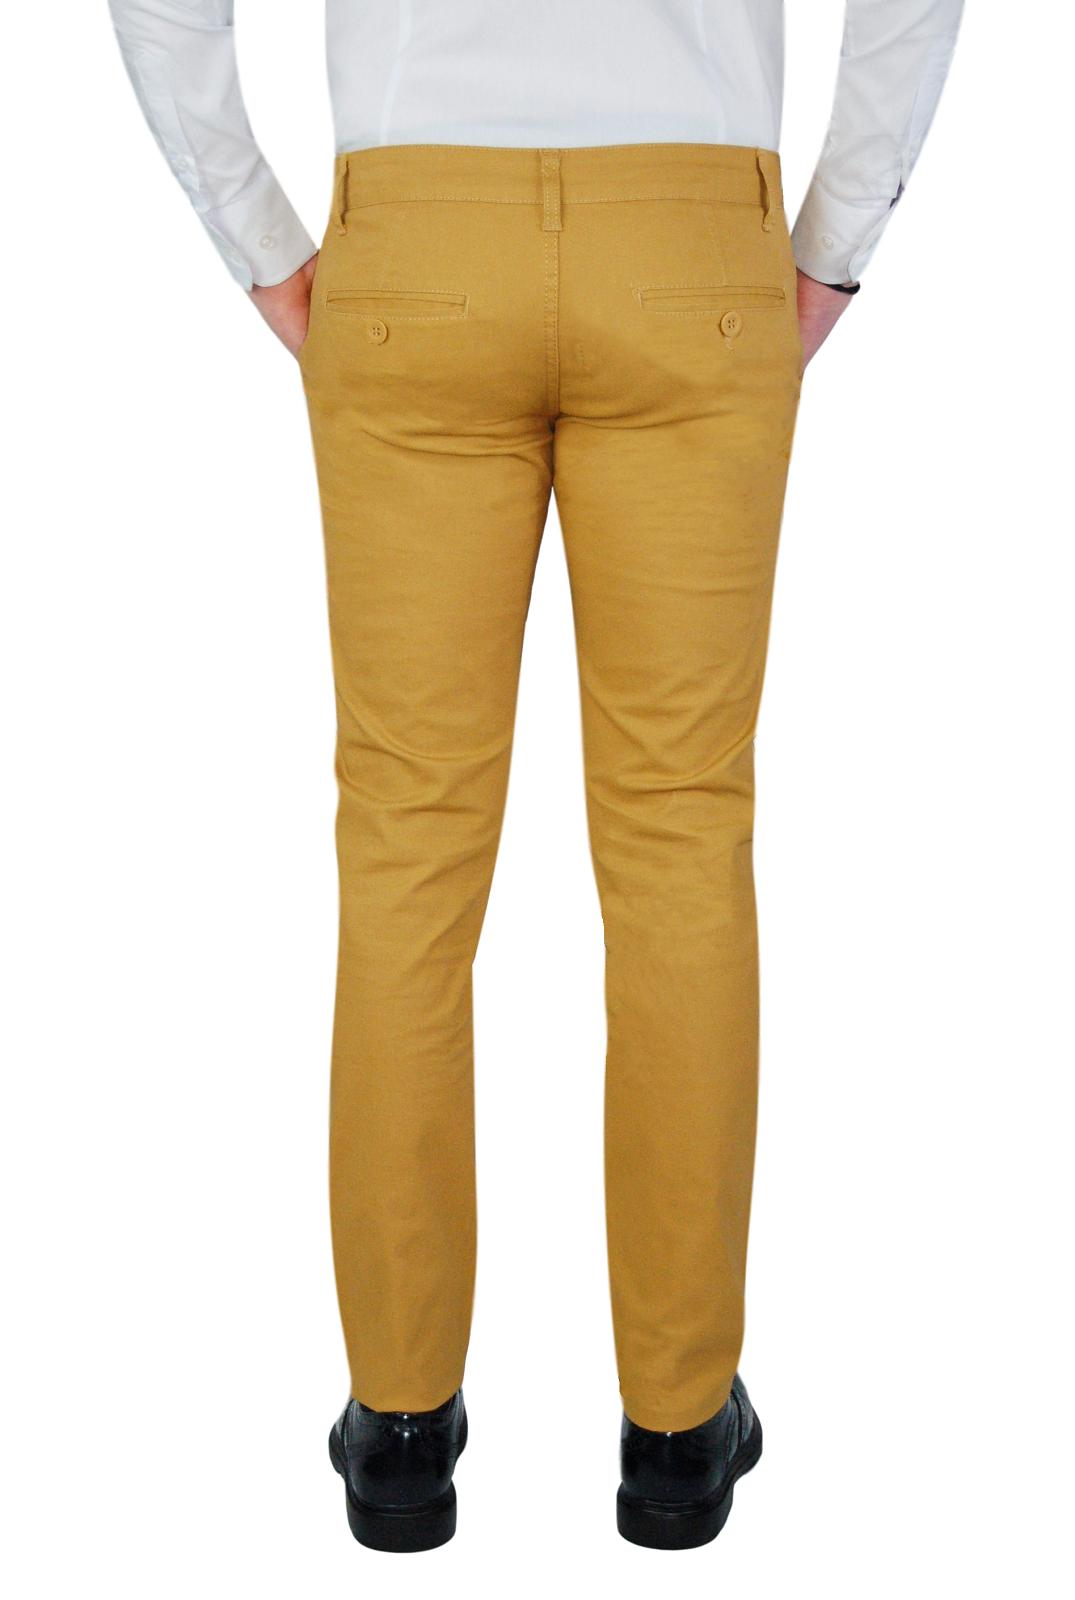 Pantalone-Uomo-Chino-Slim-fit-Primaverile-tasca-america-Bianco-Grigio-Senape-Bei miniatura 23